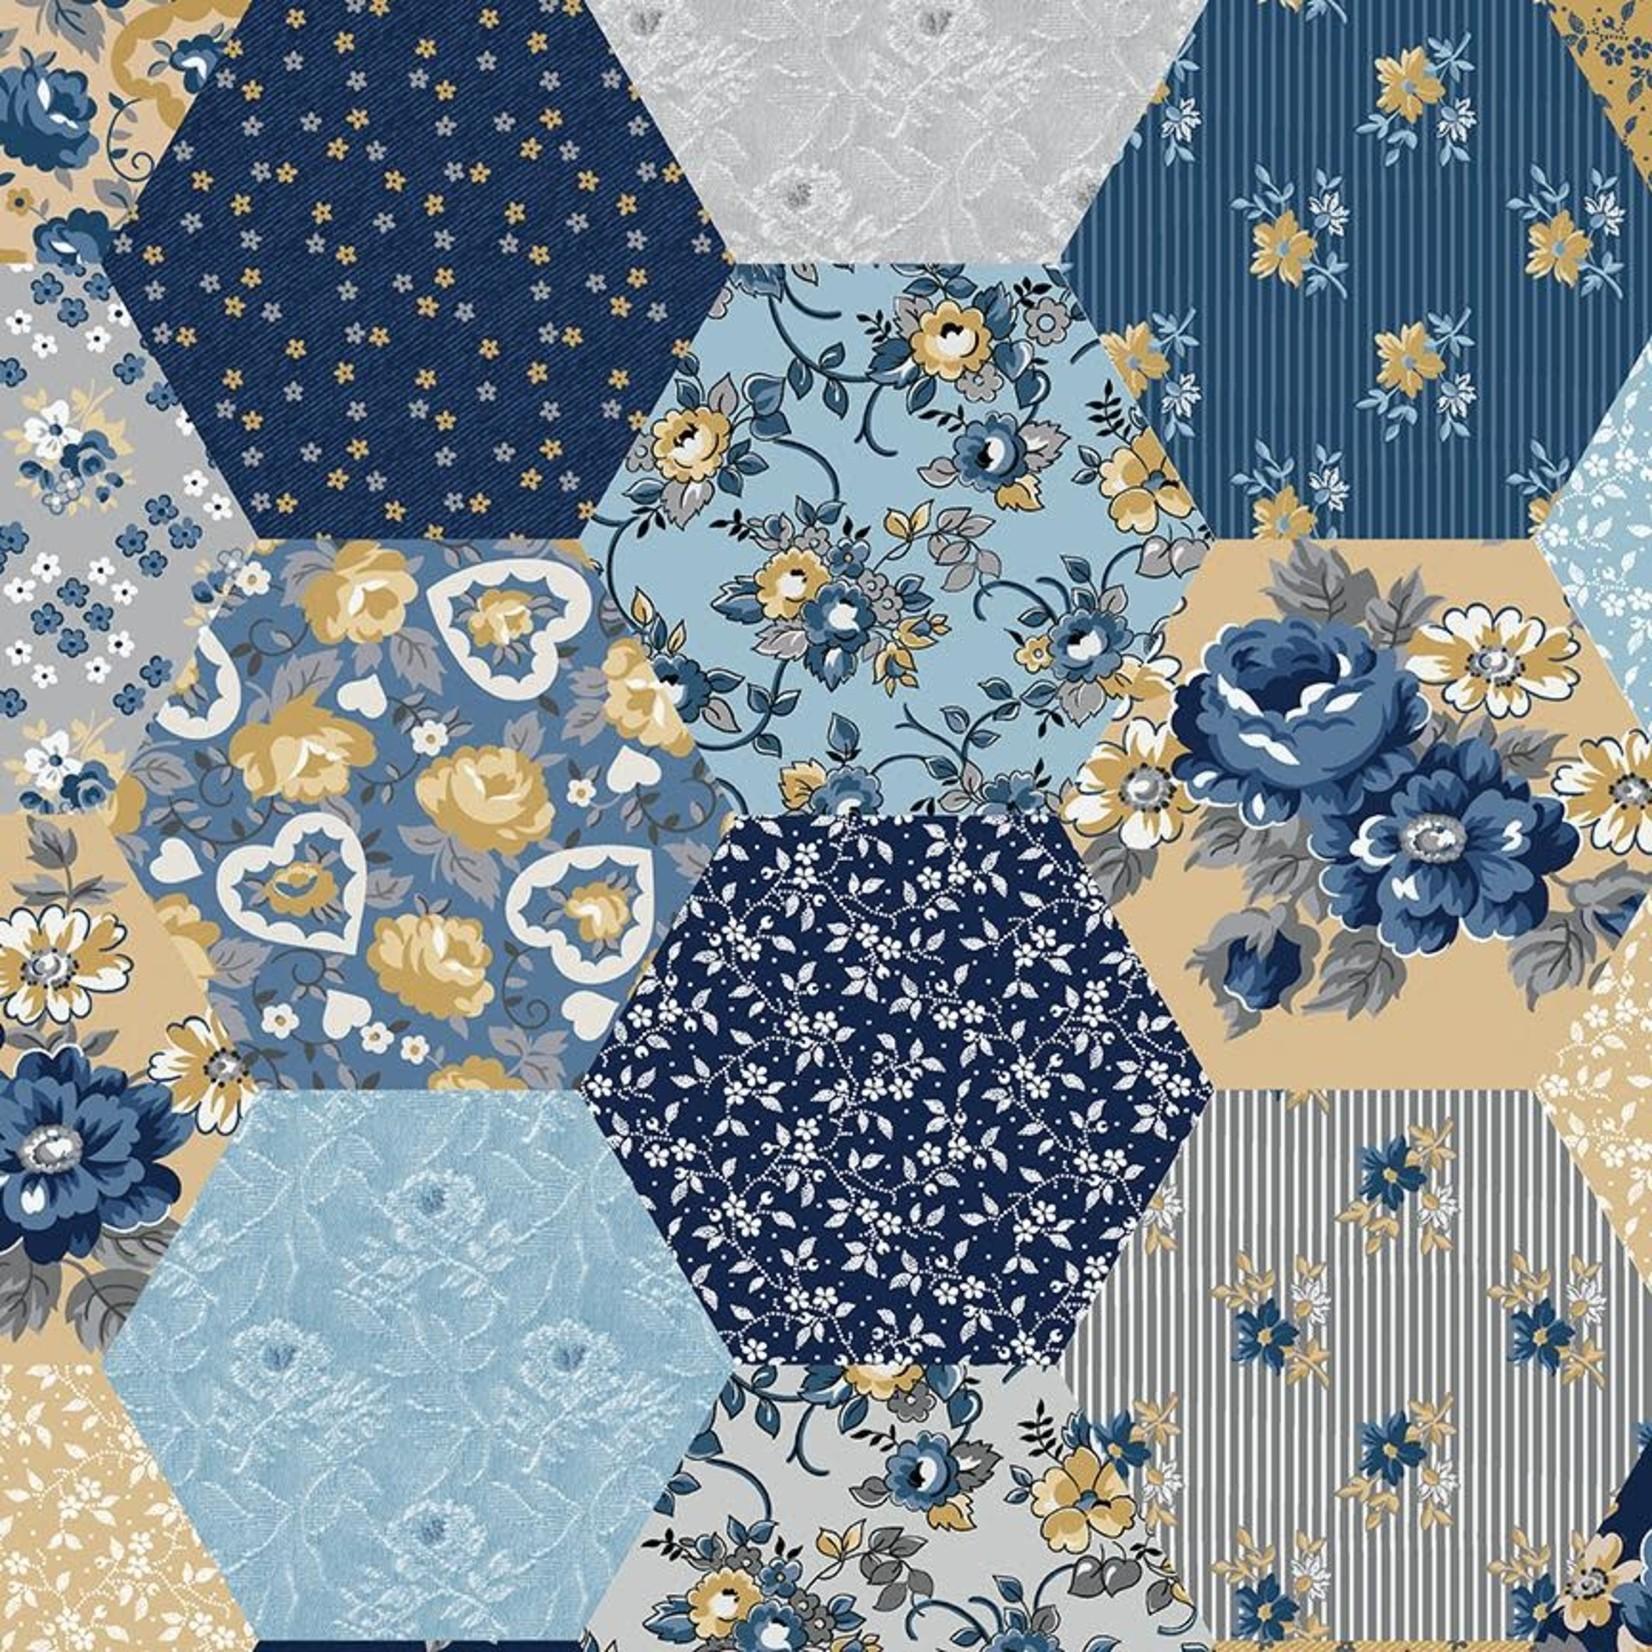 Riley Blake Designs Delightful Patchwork - Multi